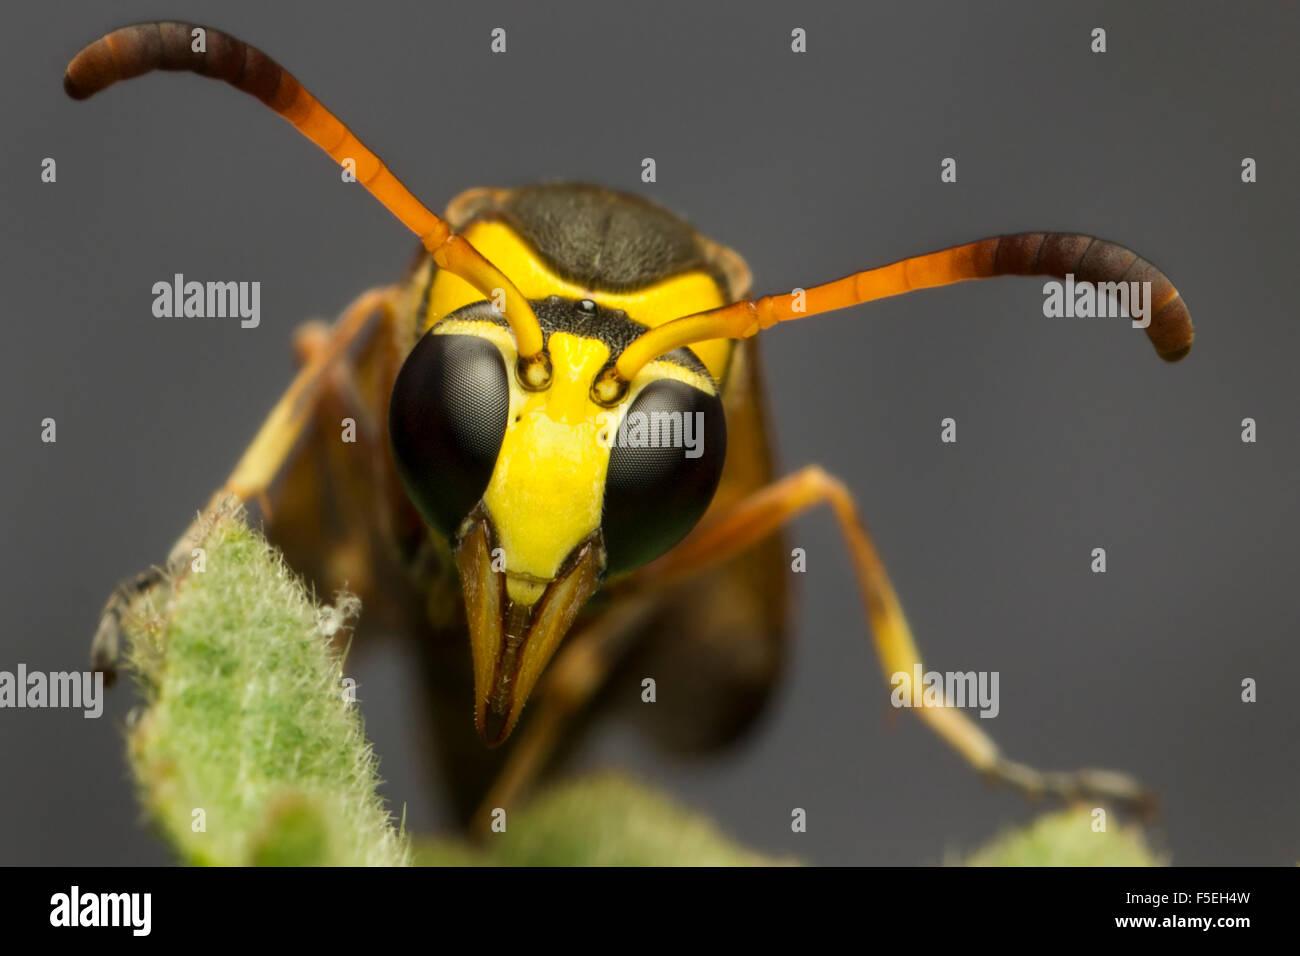 Wasp Macro Stock Photos & Wasp Macro Stock Images - Alamy